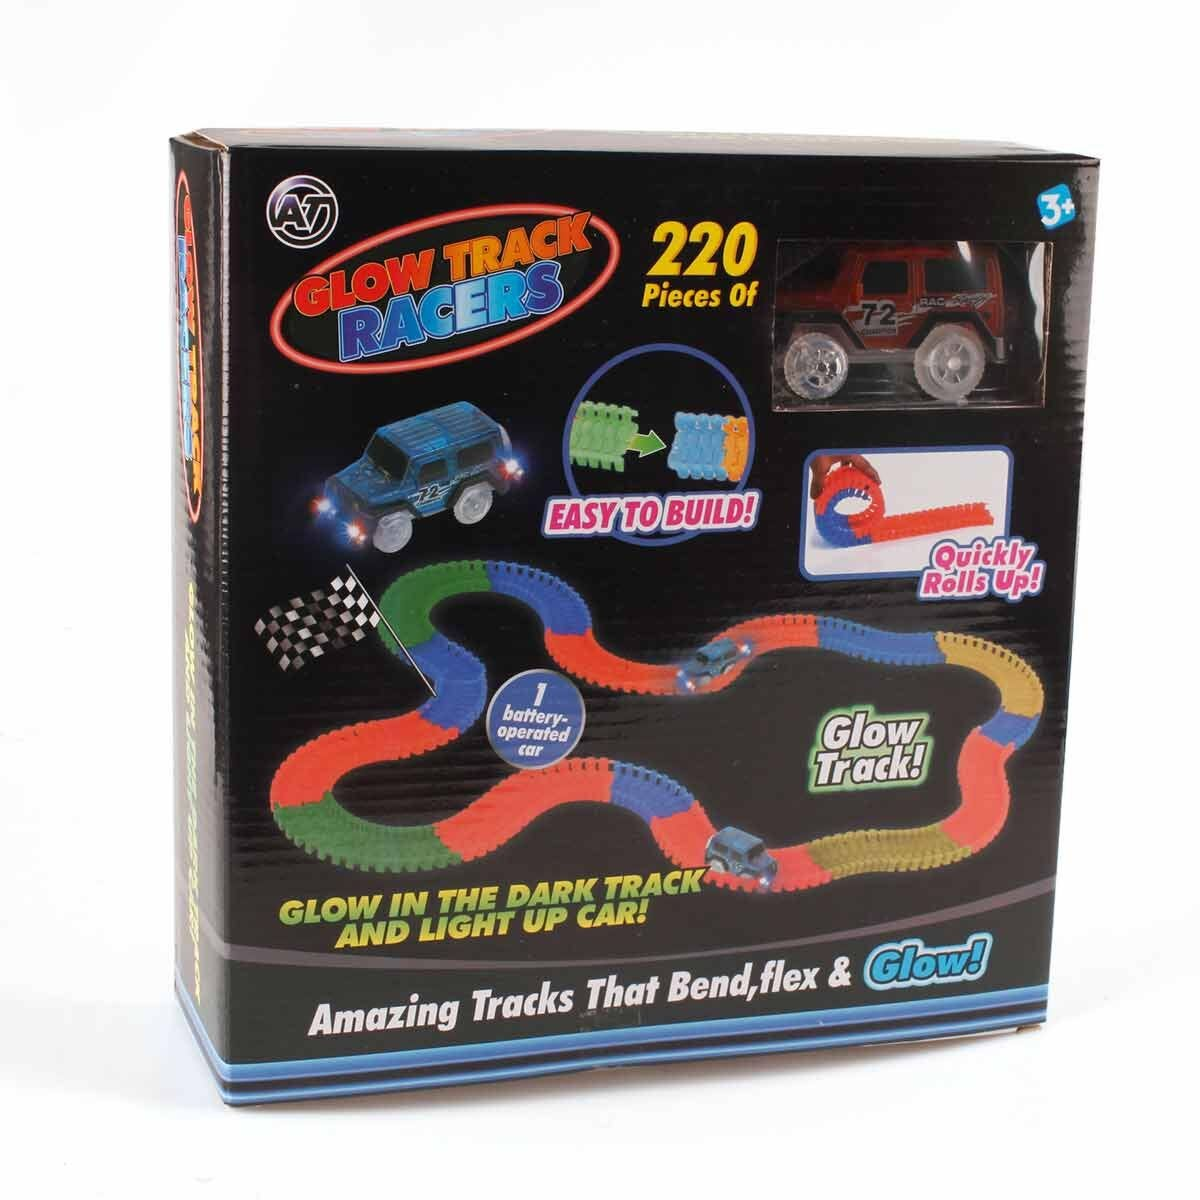 Glow Tracks Racer Set 220 Pcs